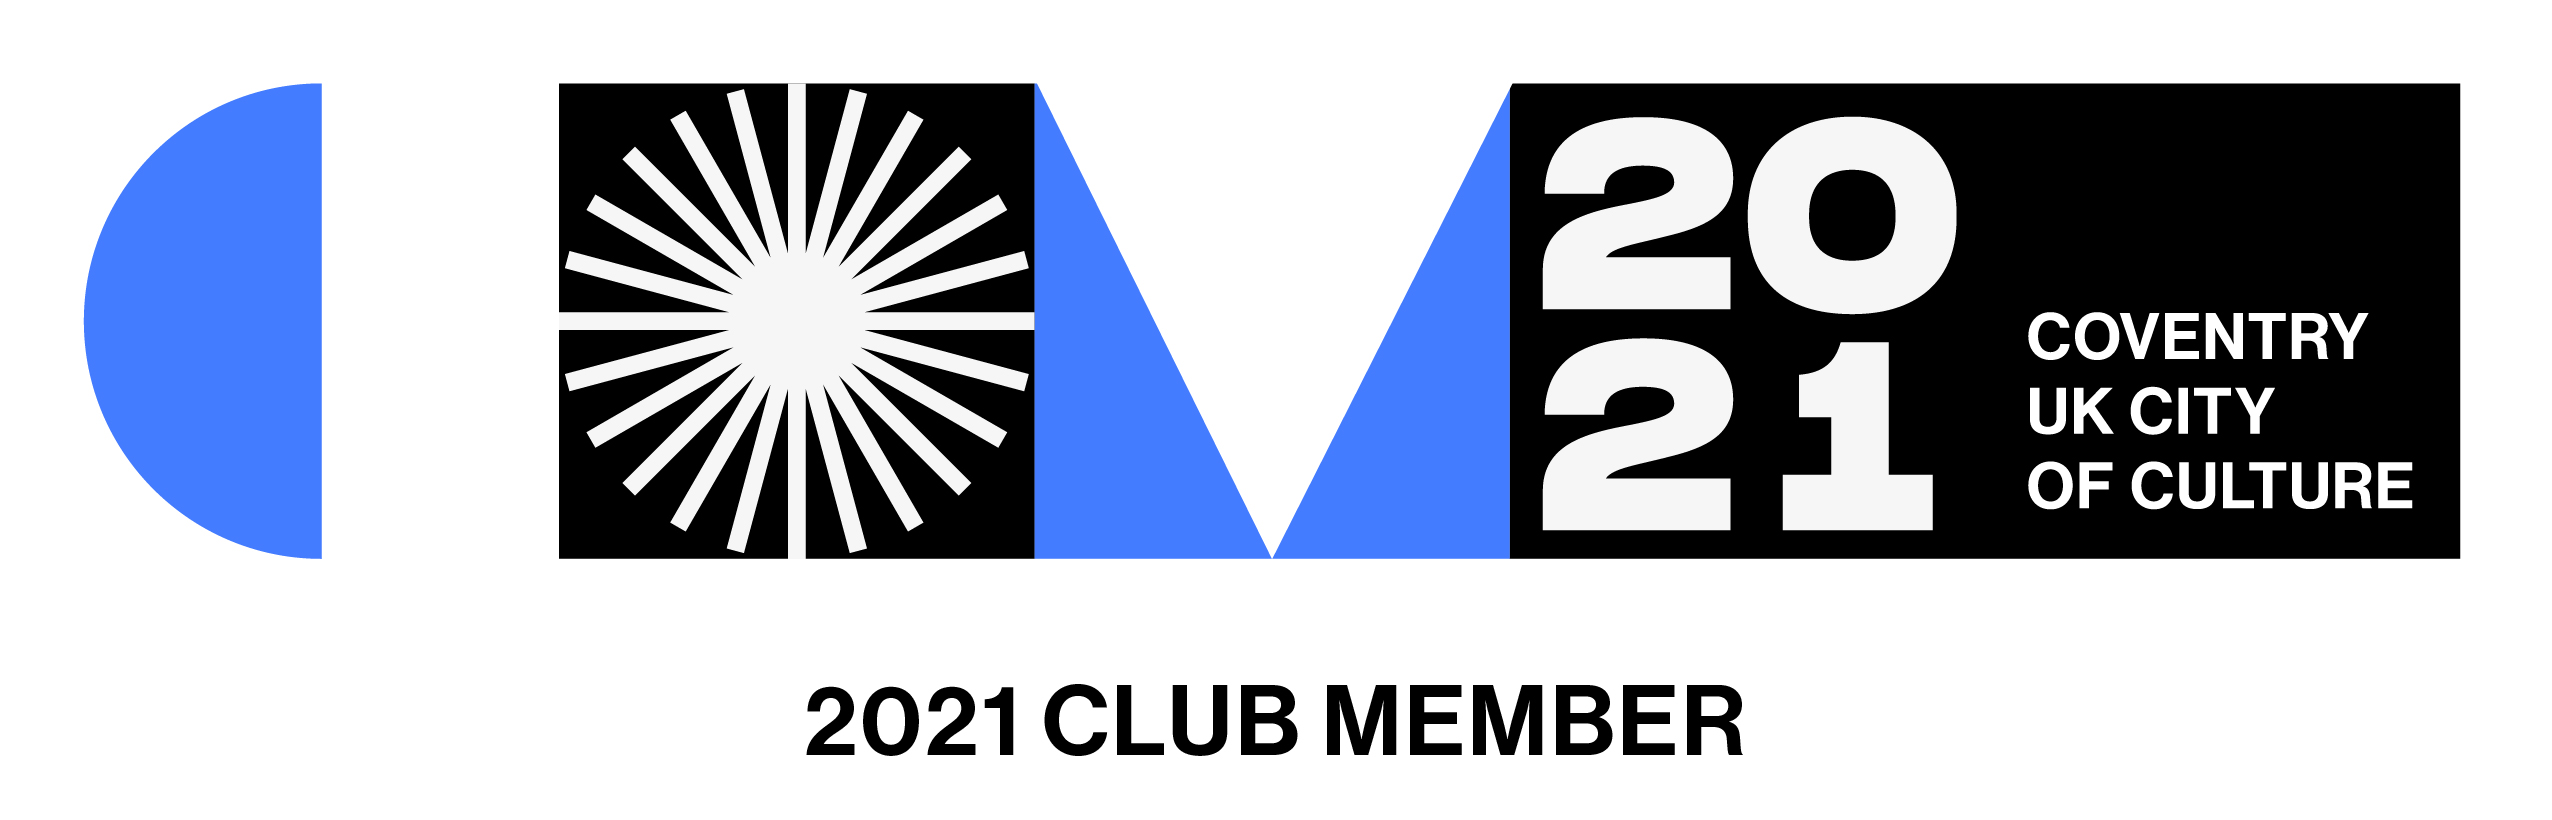 COC21 2021 CLUB MEMBER LOGO